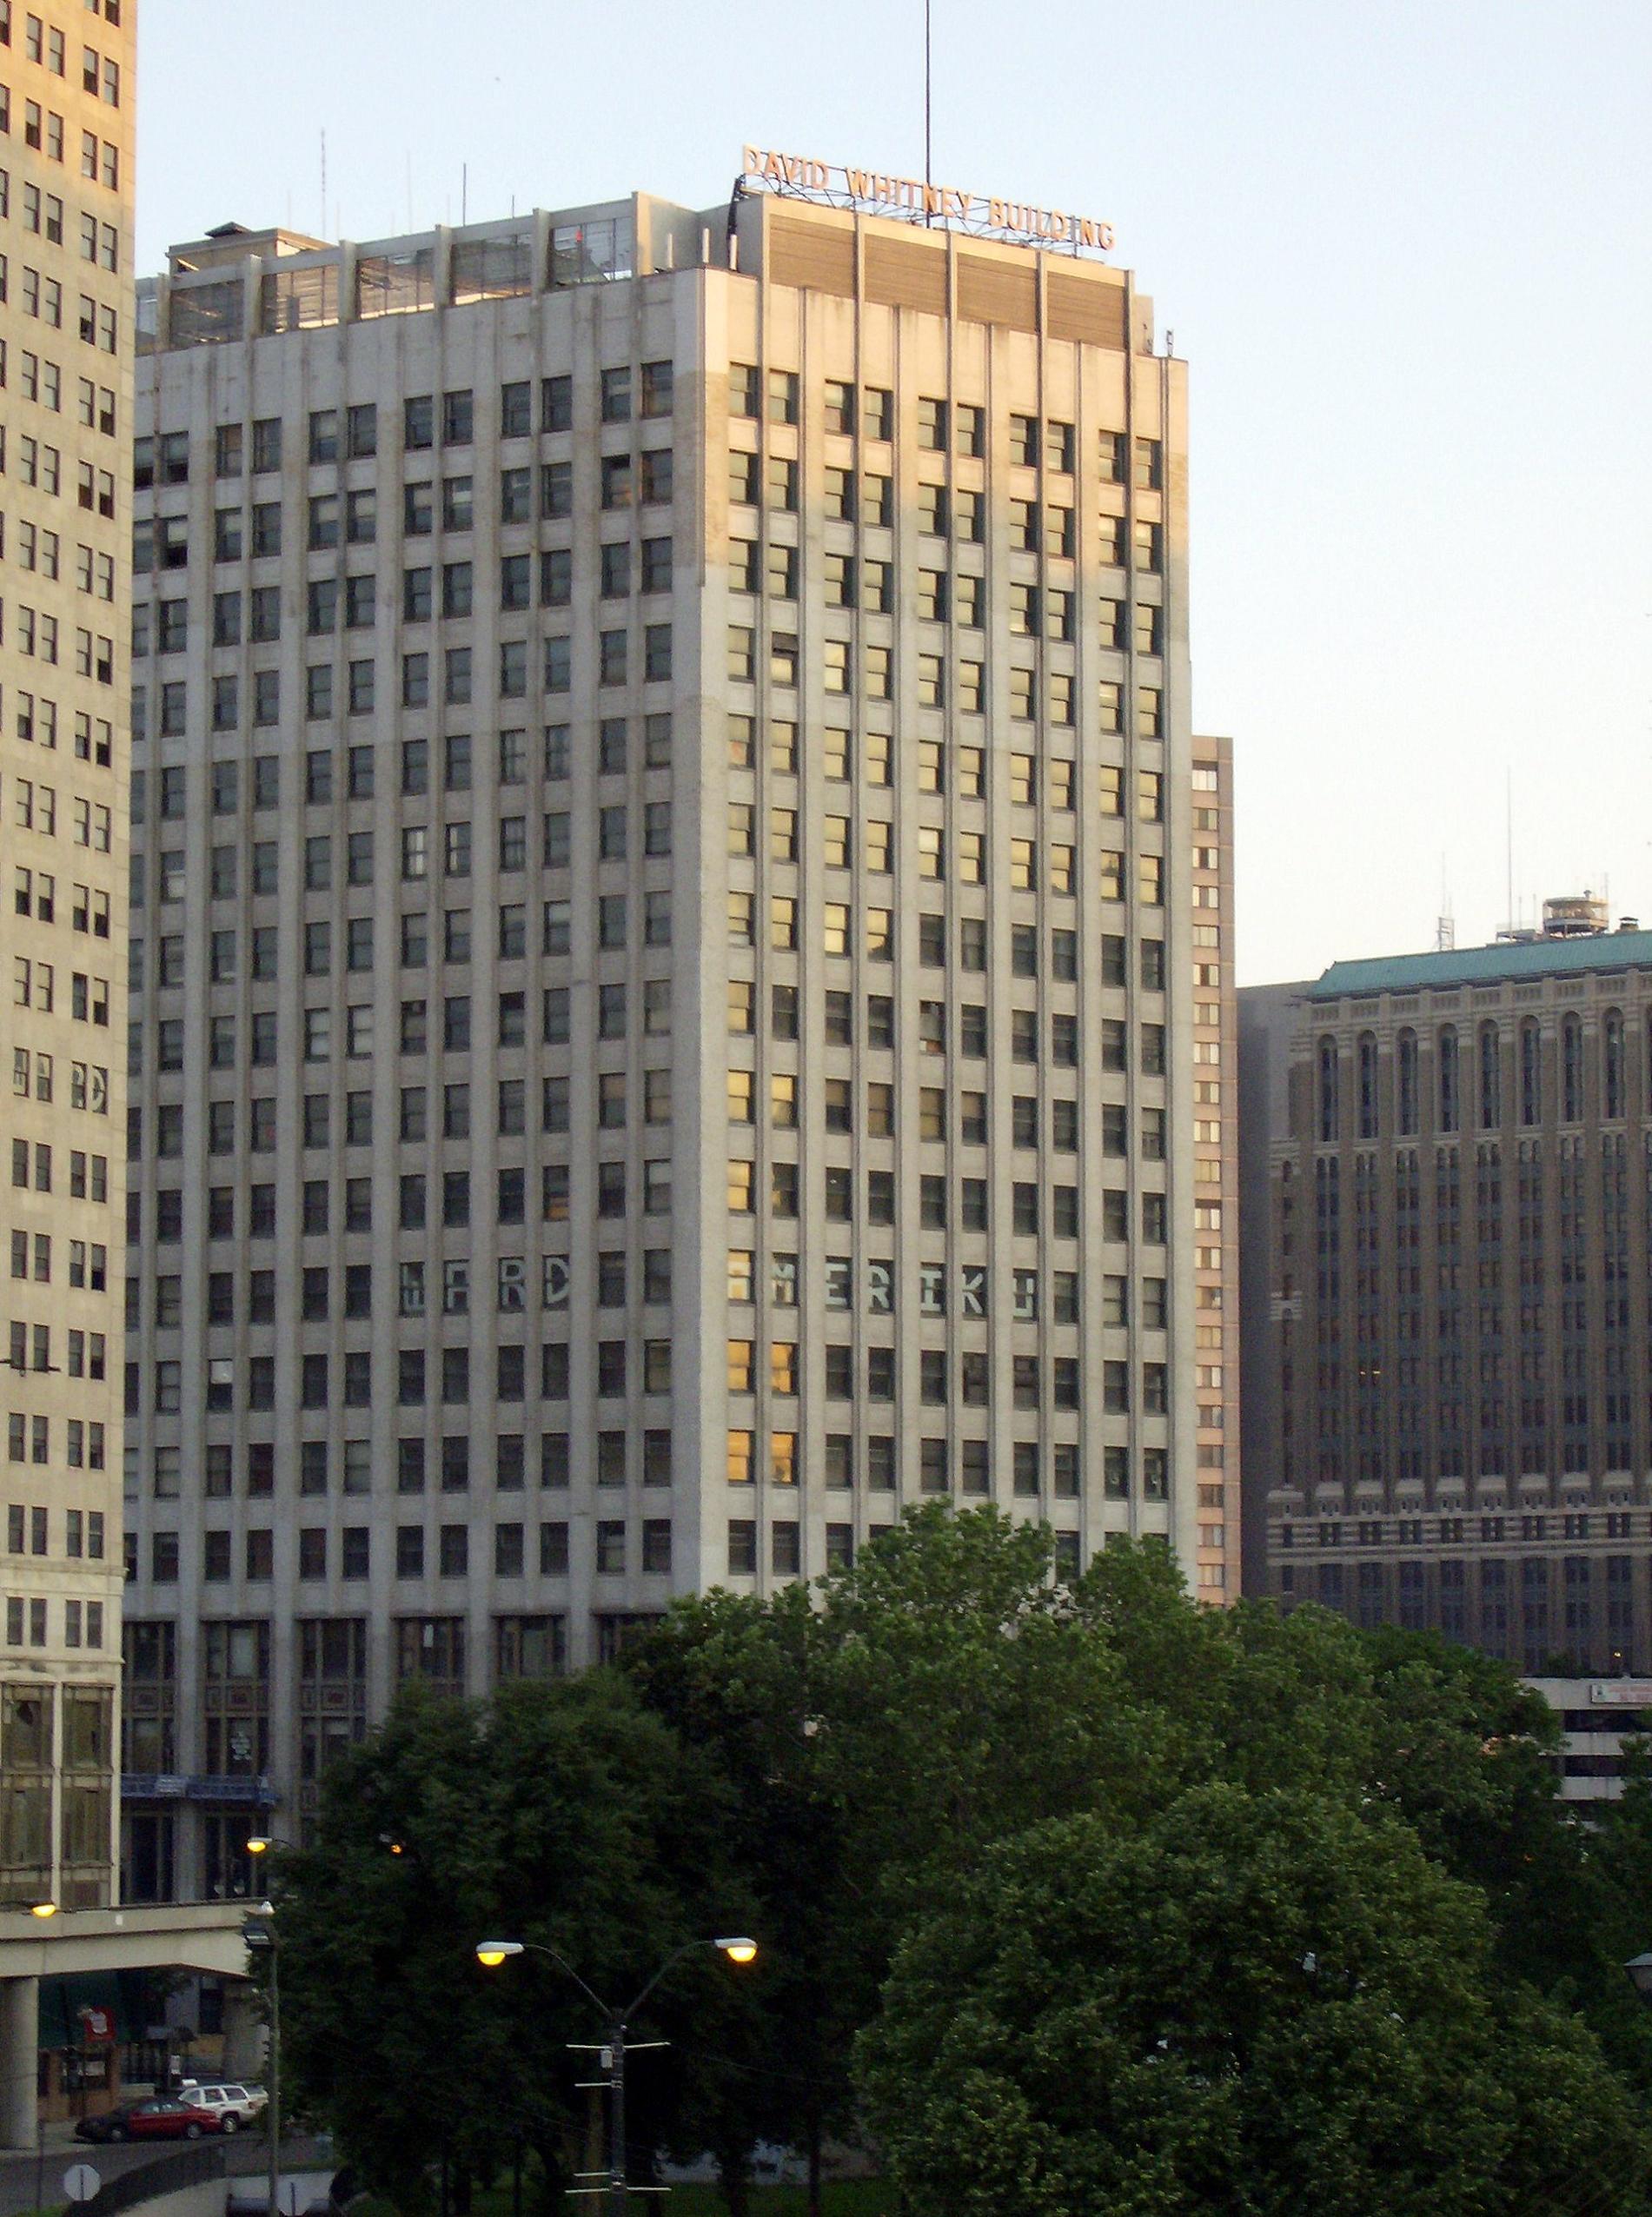 David Whitney Building